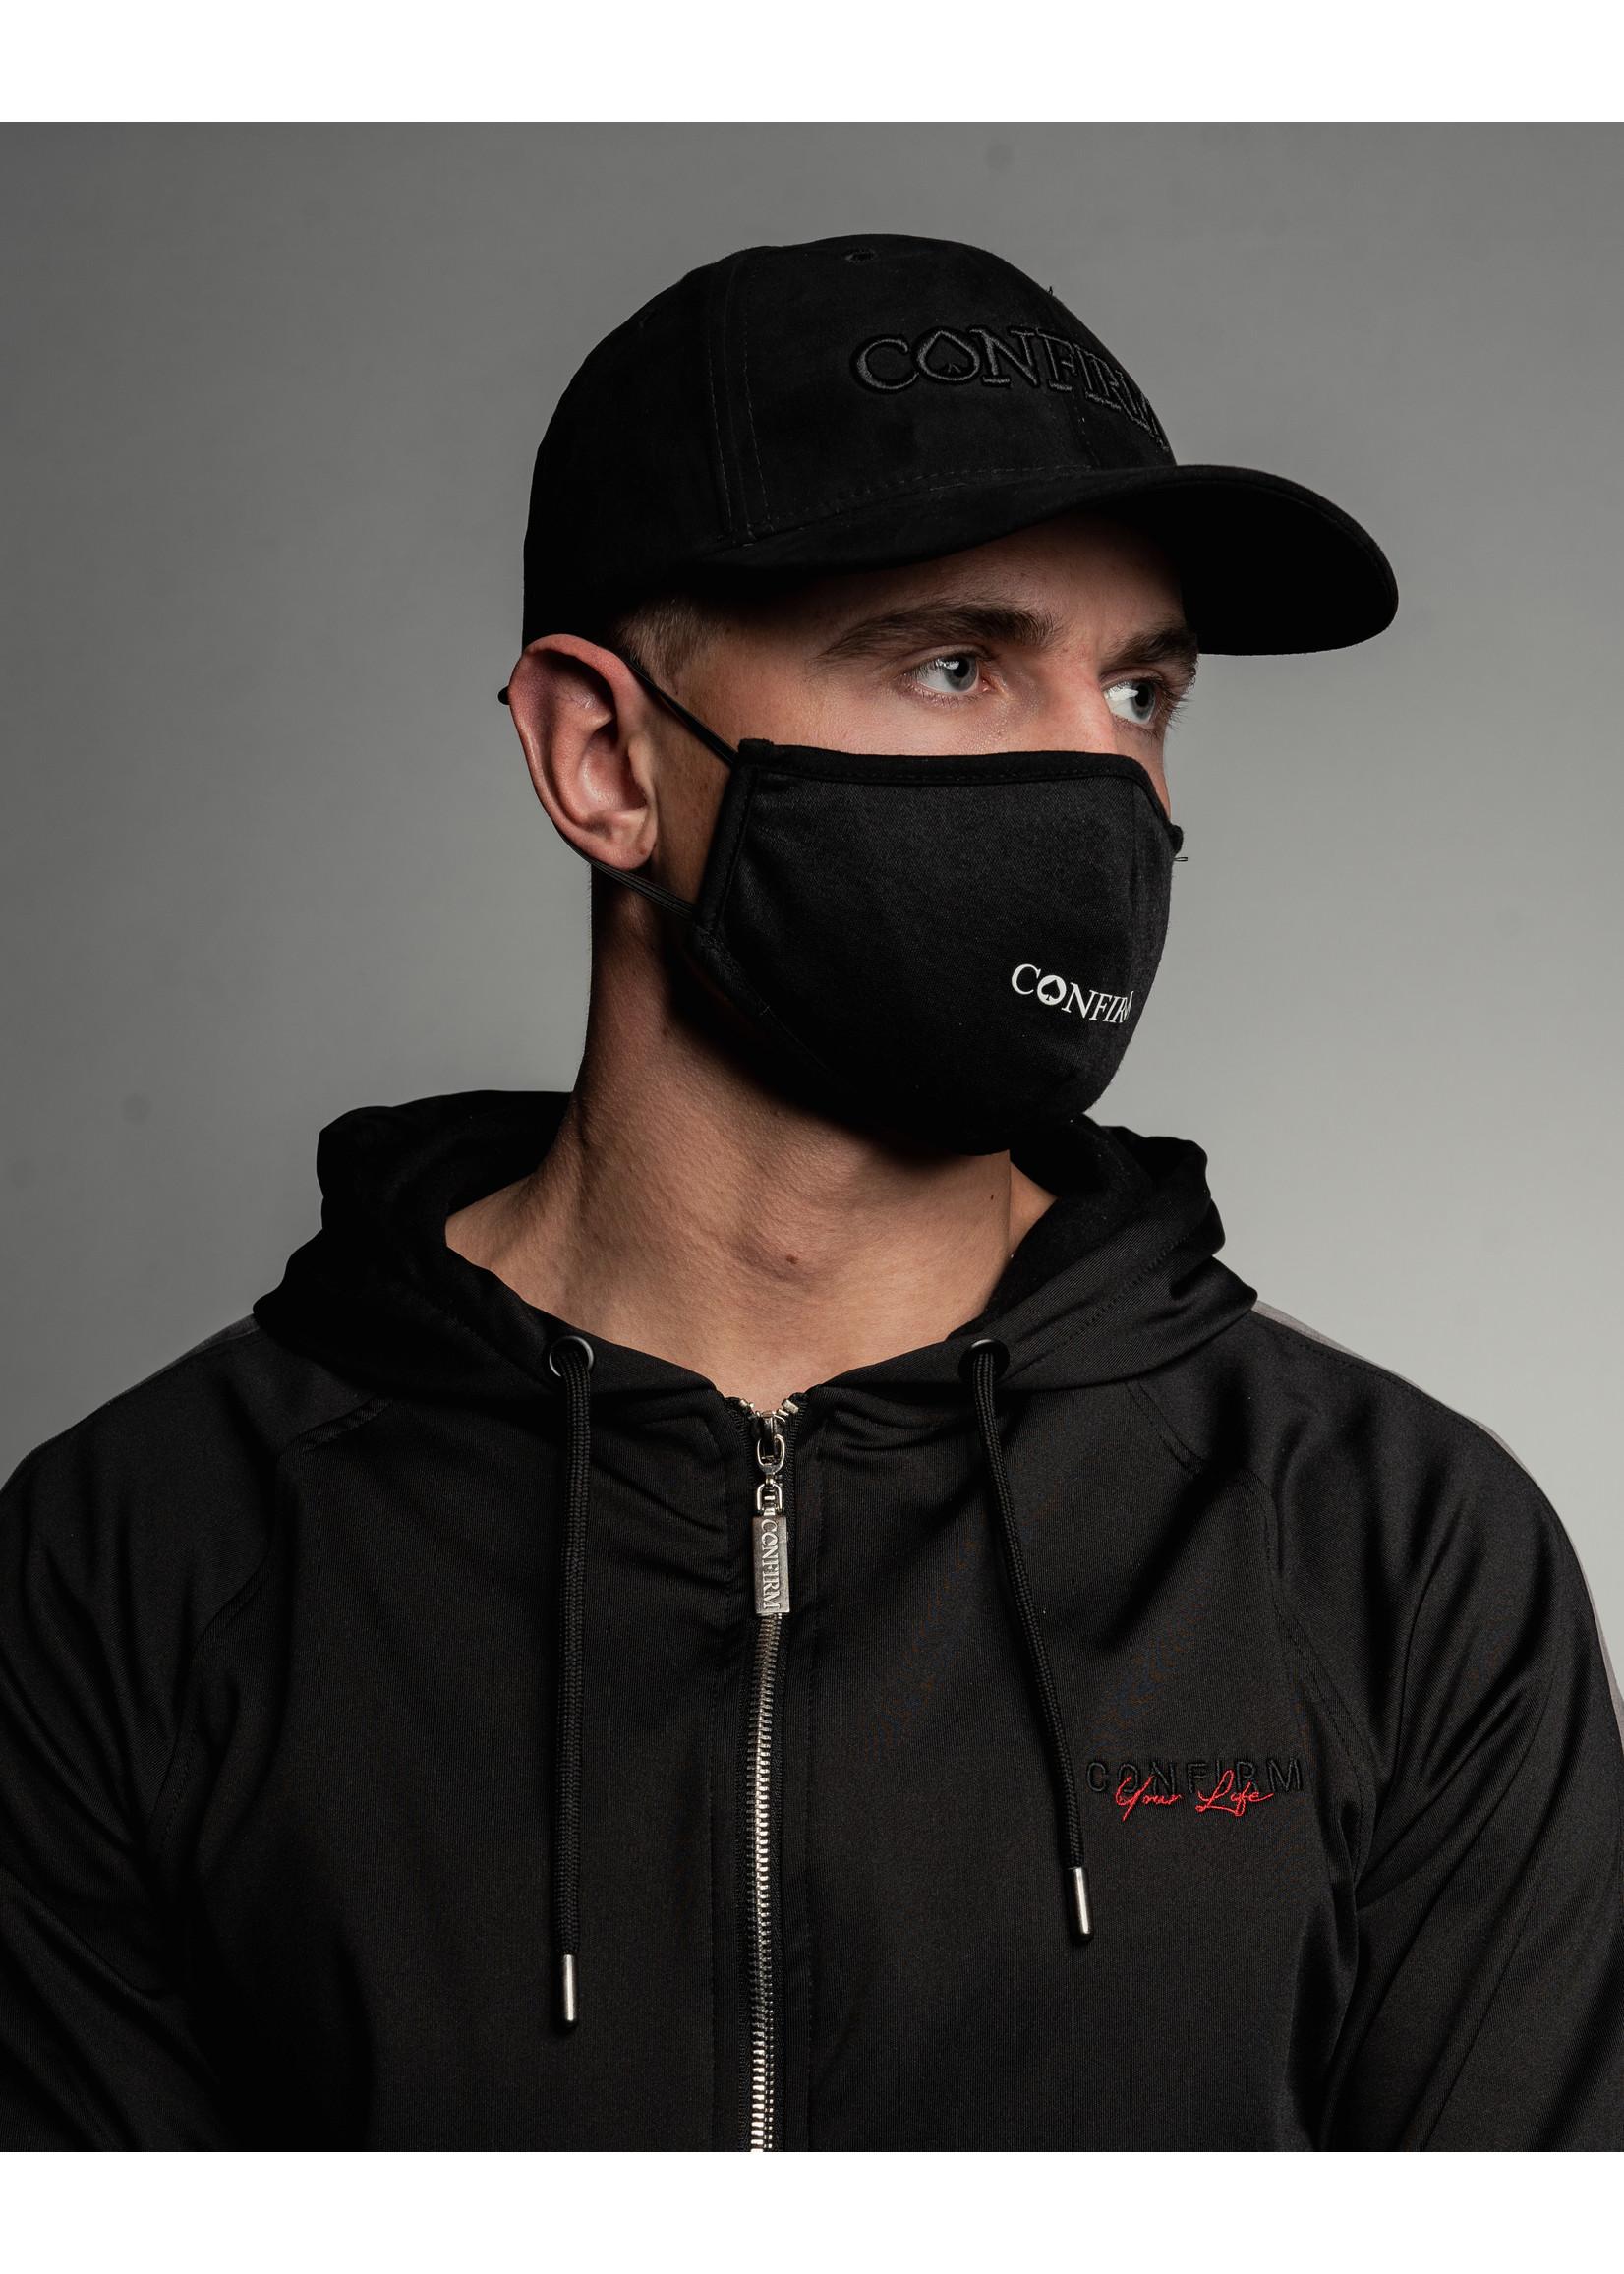 Confirm mask - black/white